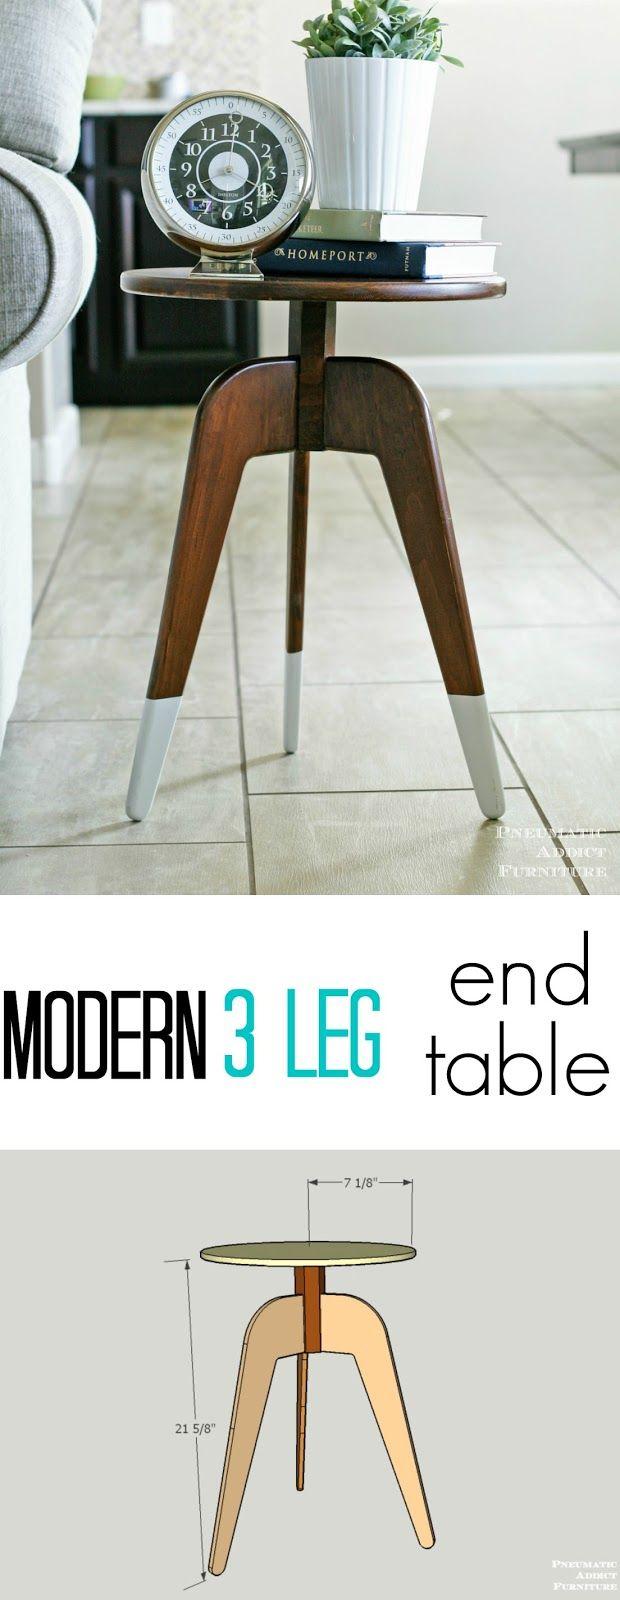 17 Best Ideas About Diy End Tables On Pinterest Pallet